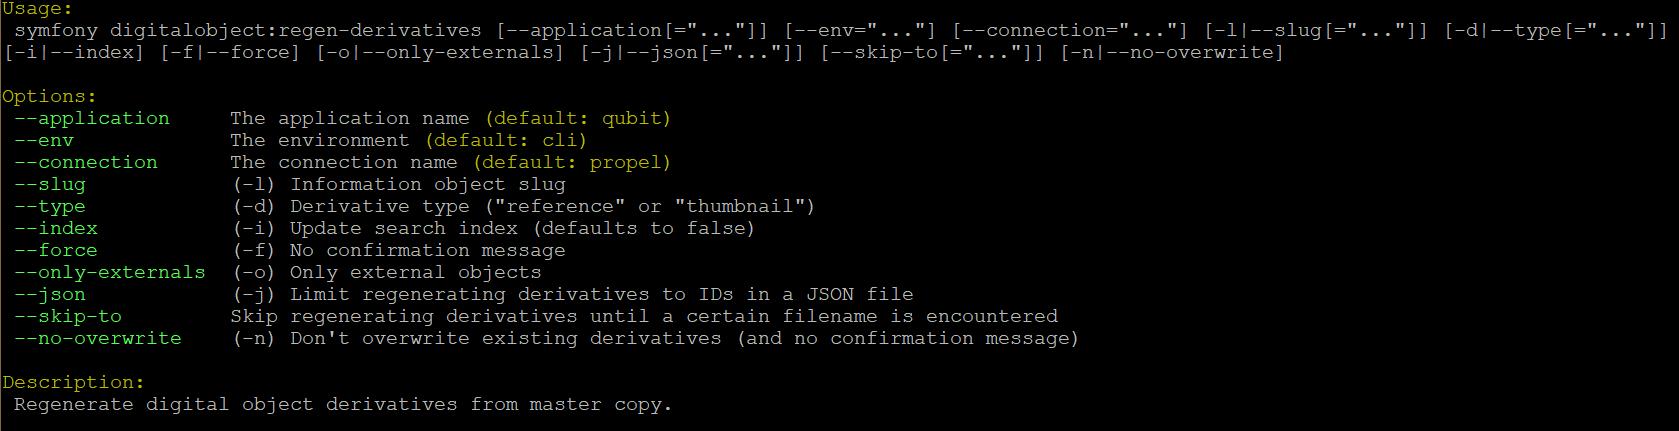 Command line tools | Documentation (Version 2 4) | AtoM